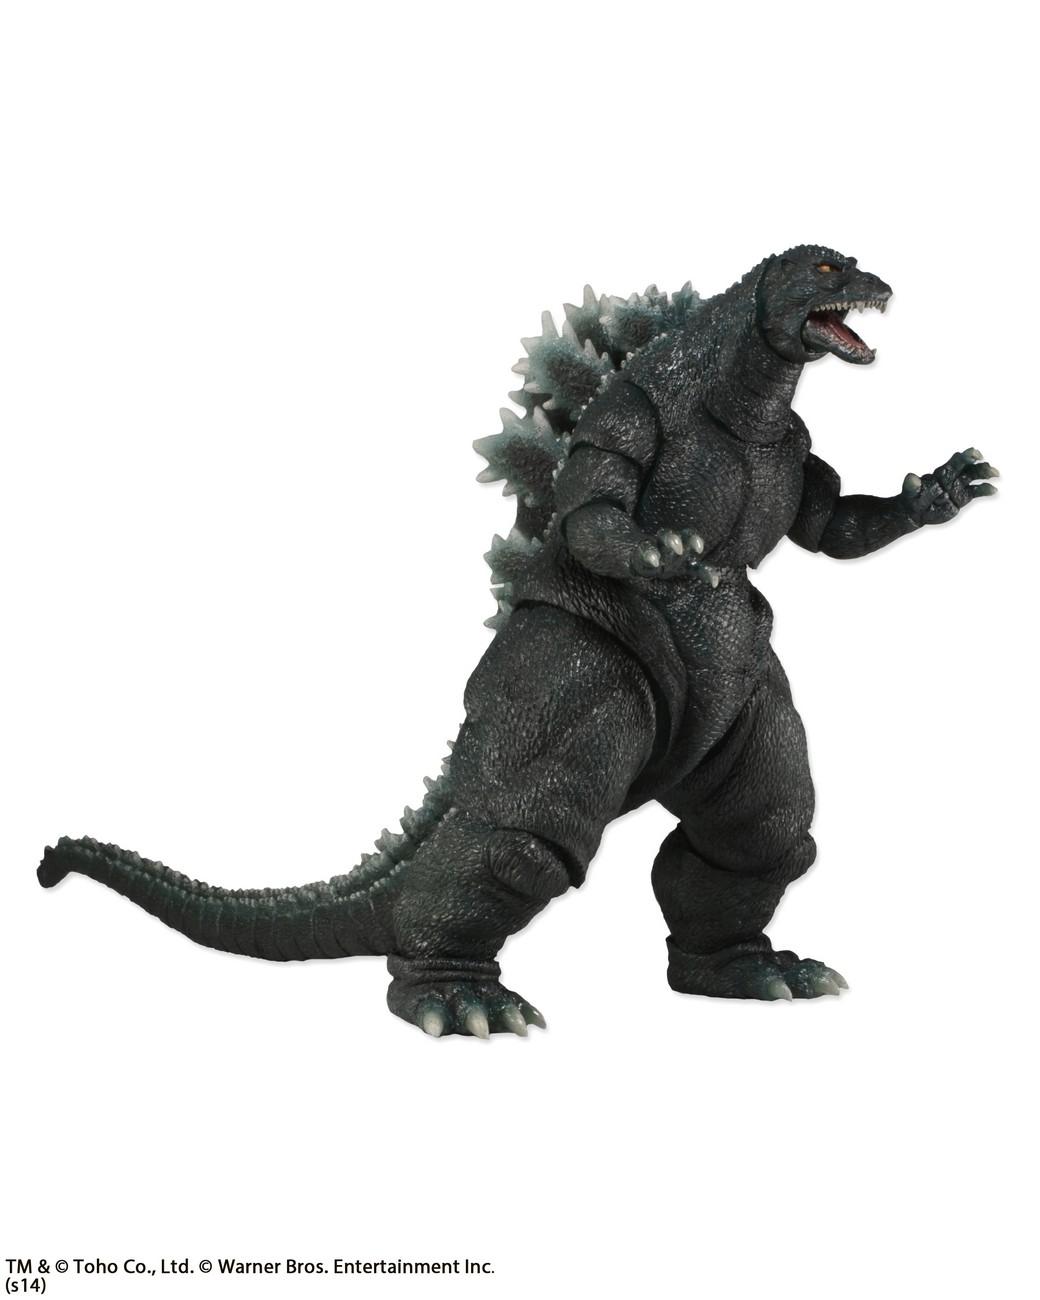 Godzilla Quotes: NECA Godzilla Discussion Thread